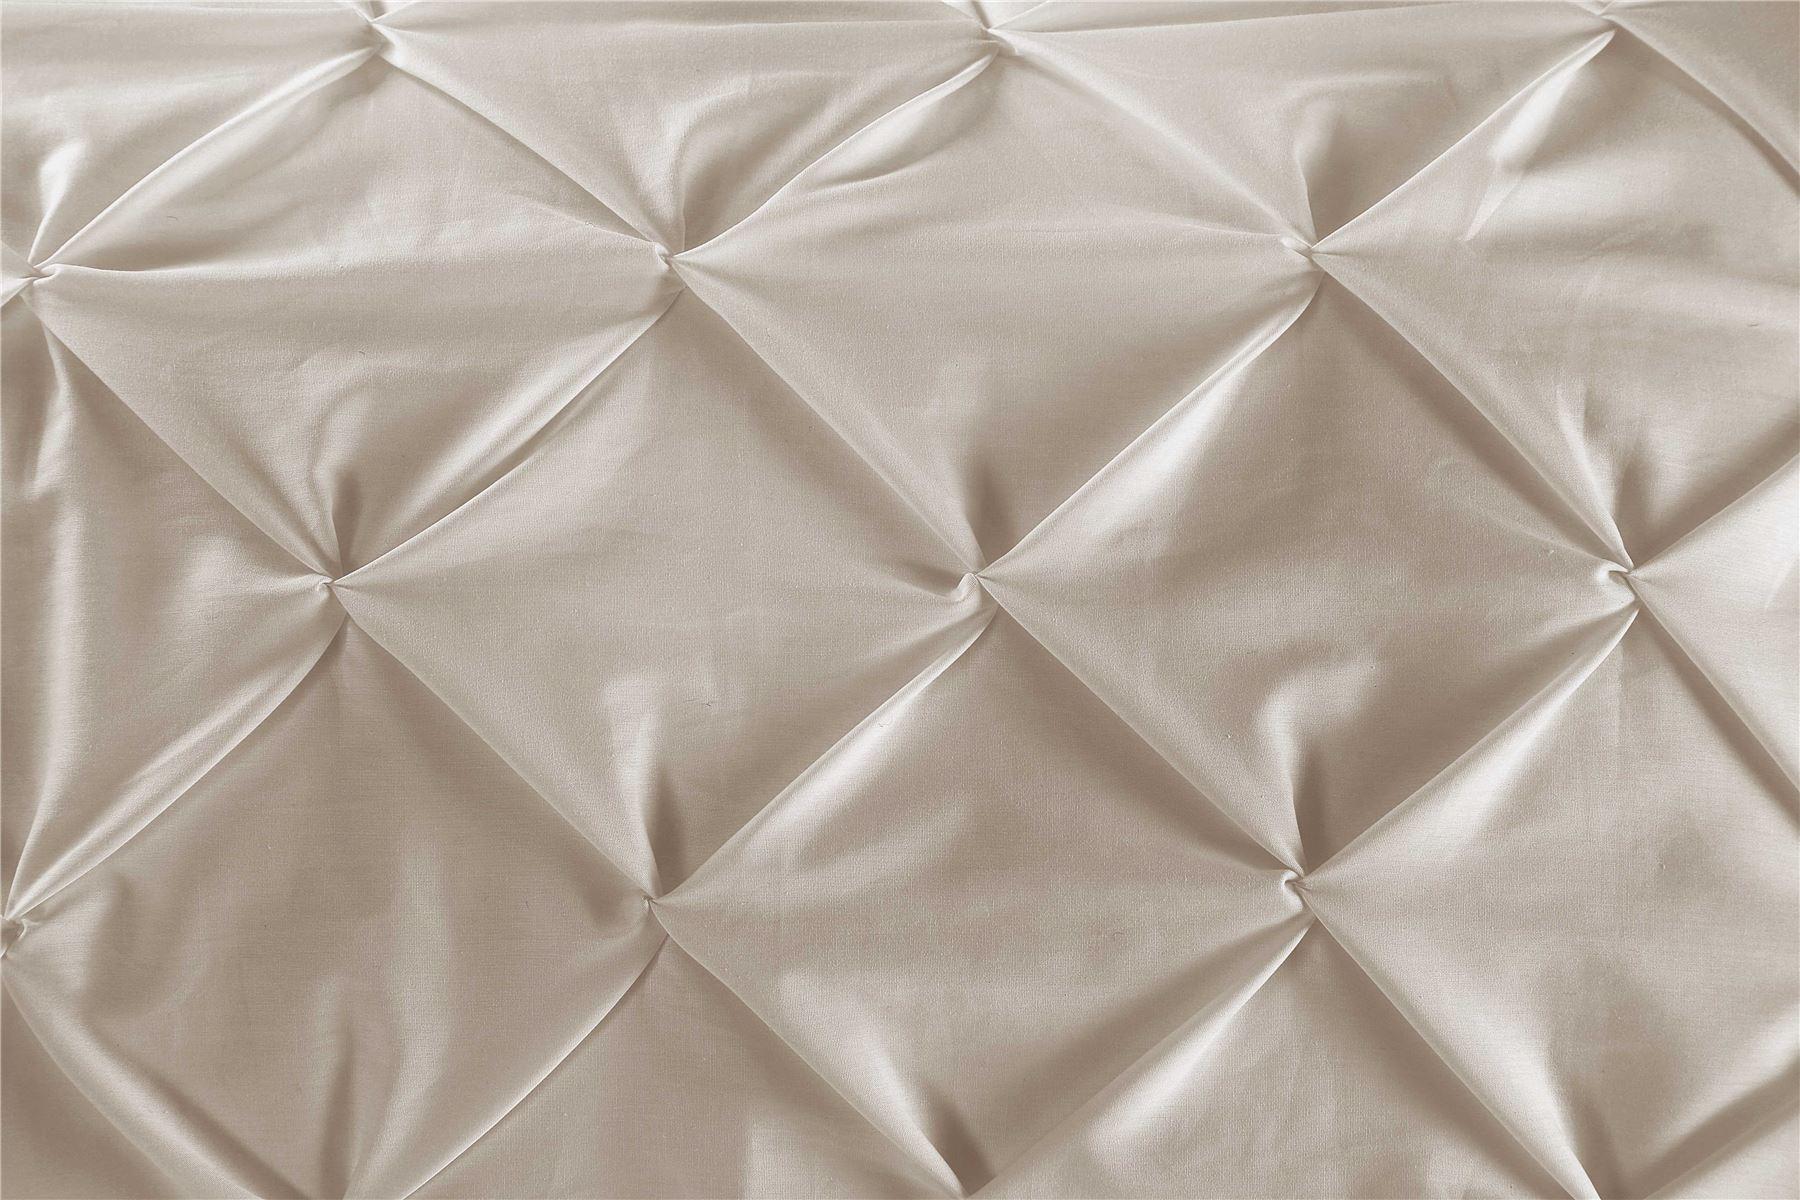 Luxury-Pure-100-Cotton-200-Thread-Pinch-Pleat-Pintuck-Puckering-Duvet-Cover-Set thumbnail 56